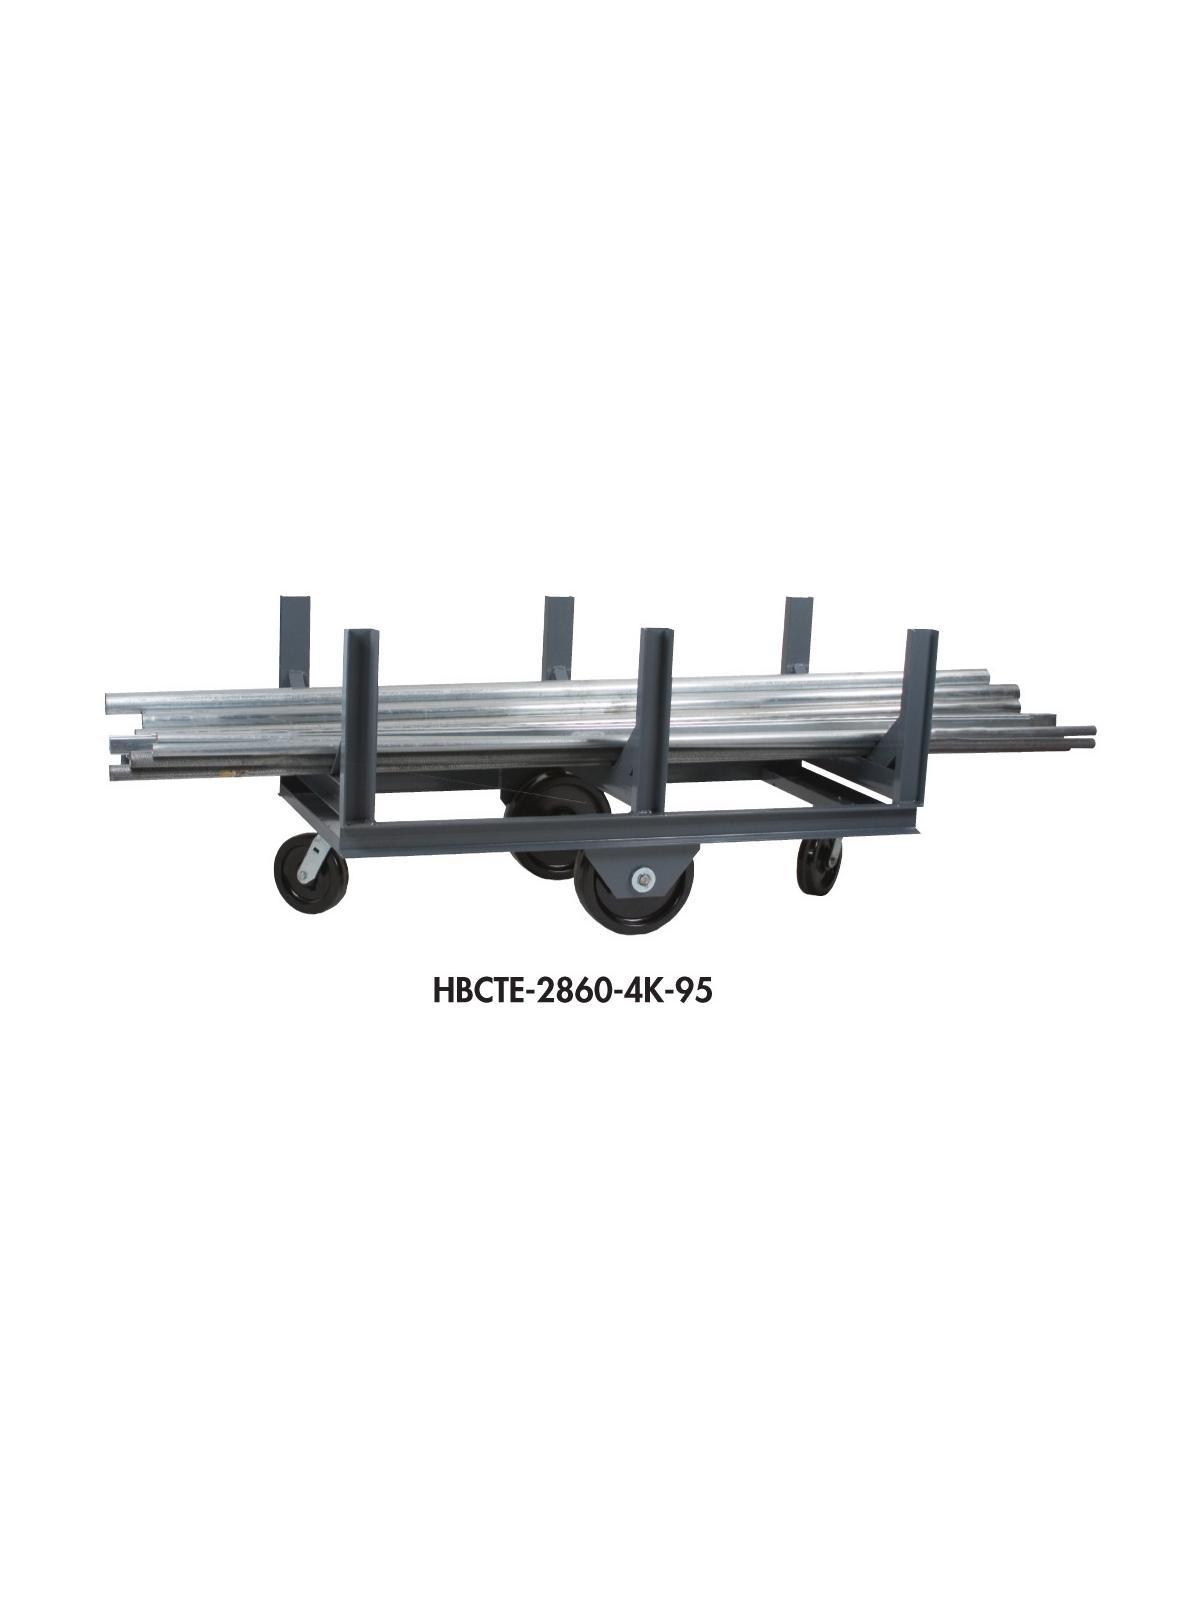 Bar Cradle Trucks At Nationwide Industrial Supply Llc